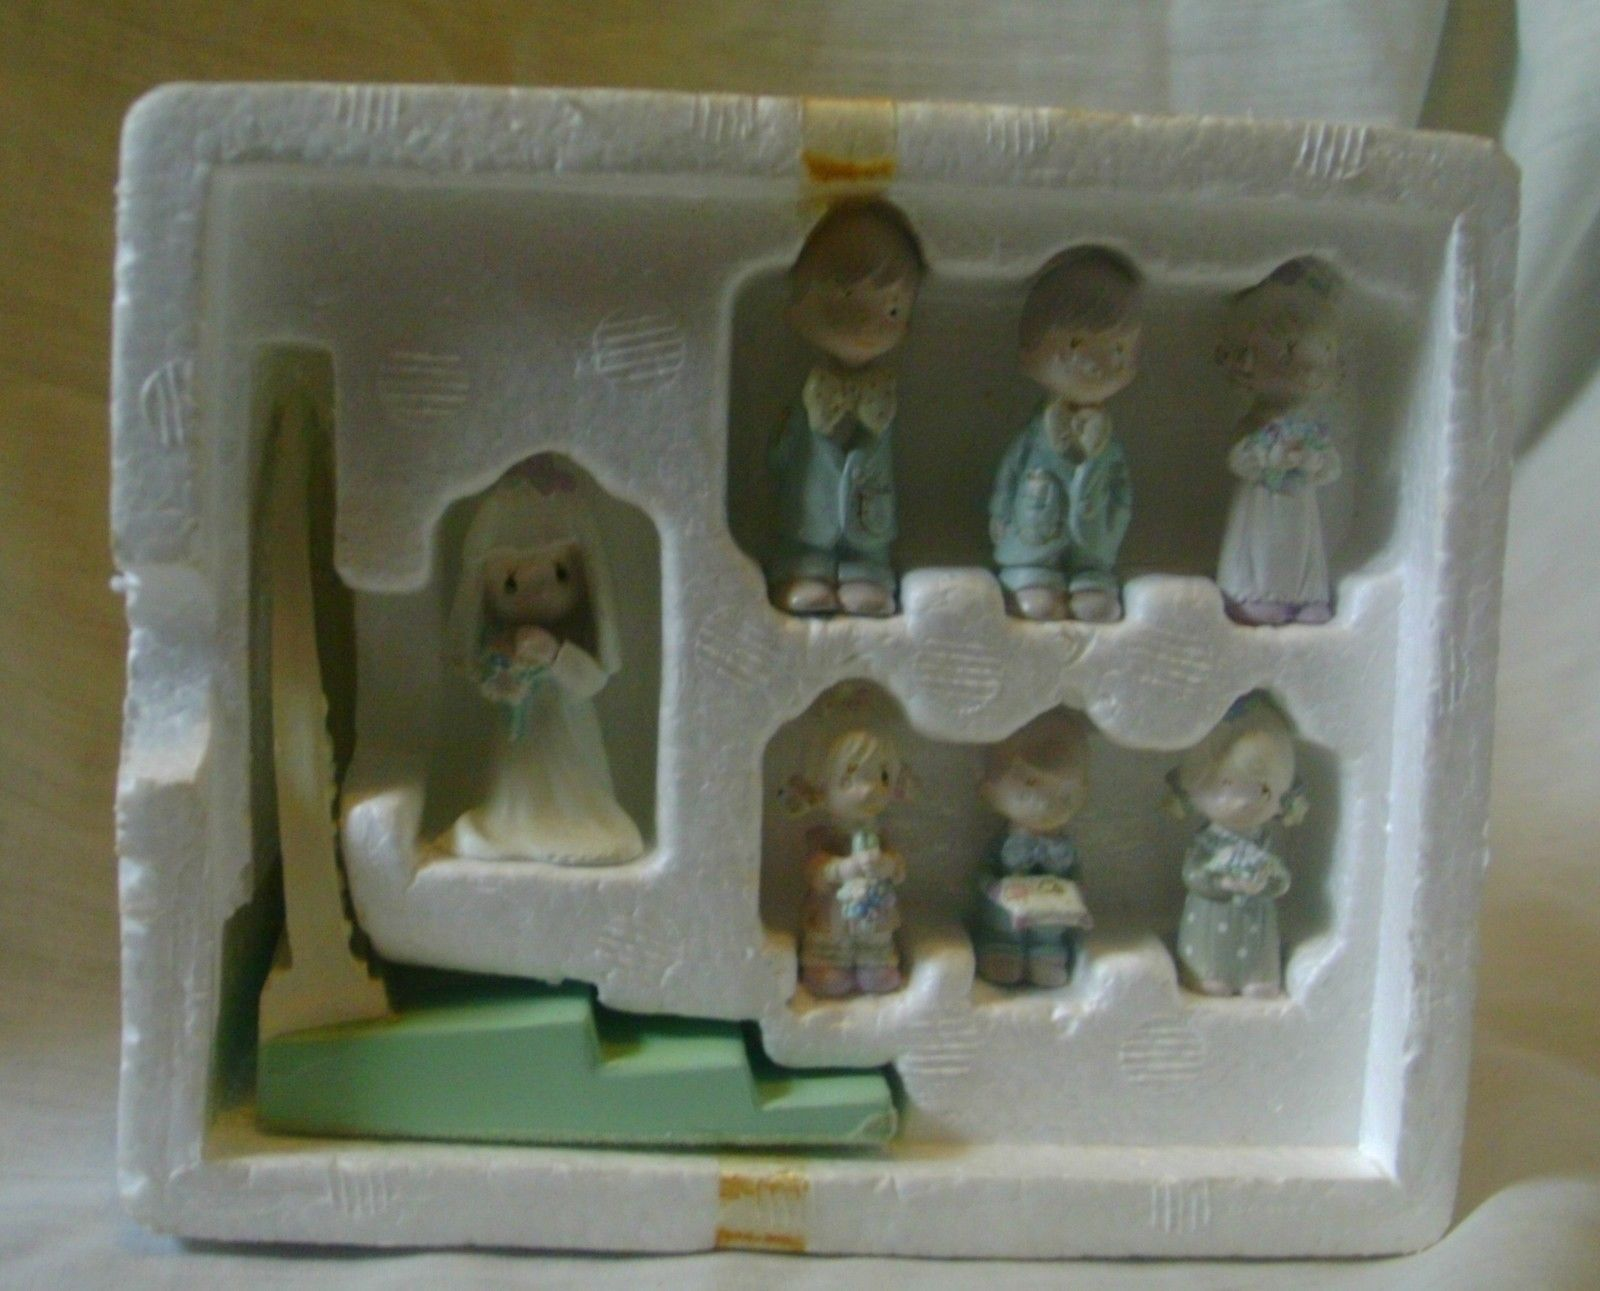 Precious Moments Miniature Pewter Bridal Set 1989 image 4